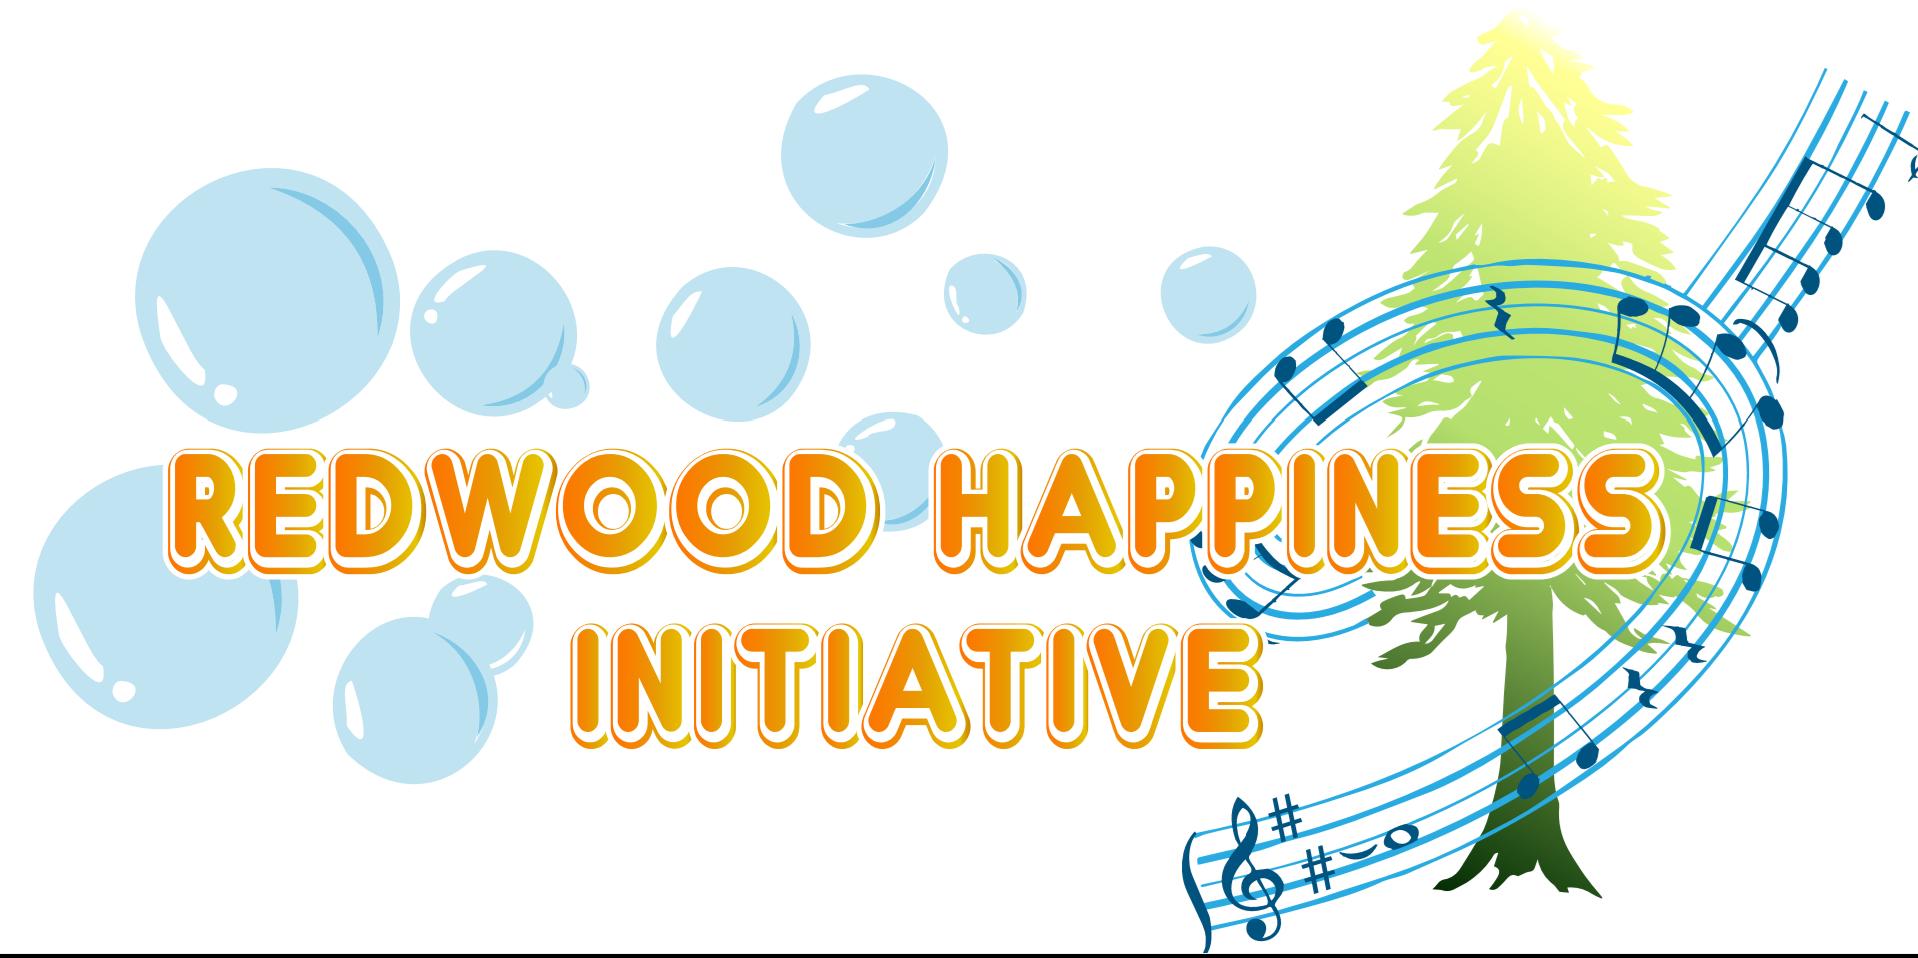 Redwood Happiness